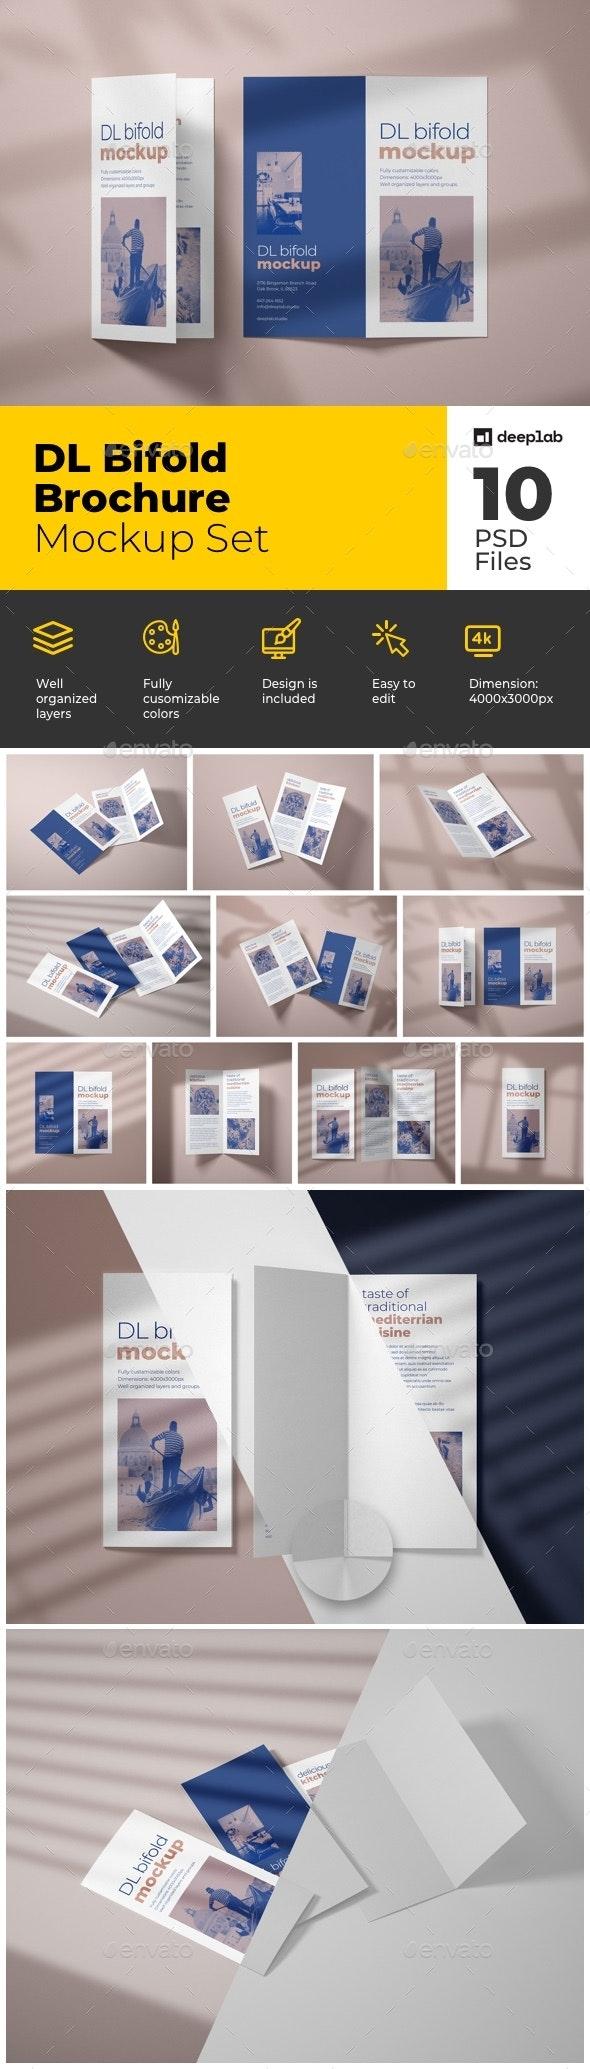 DL Bifold Brochure Mockup Set - Product Mock-Ups Graphics